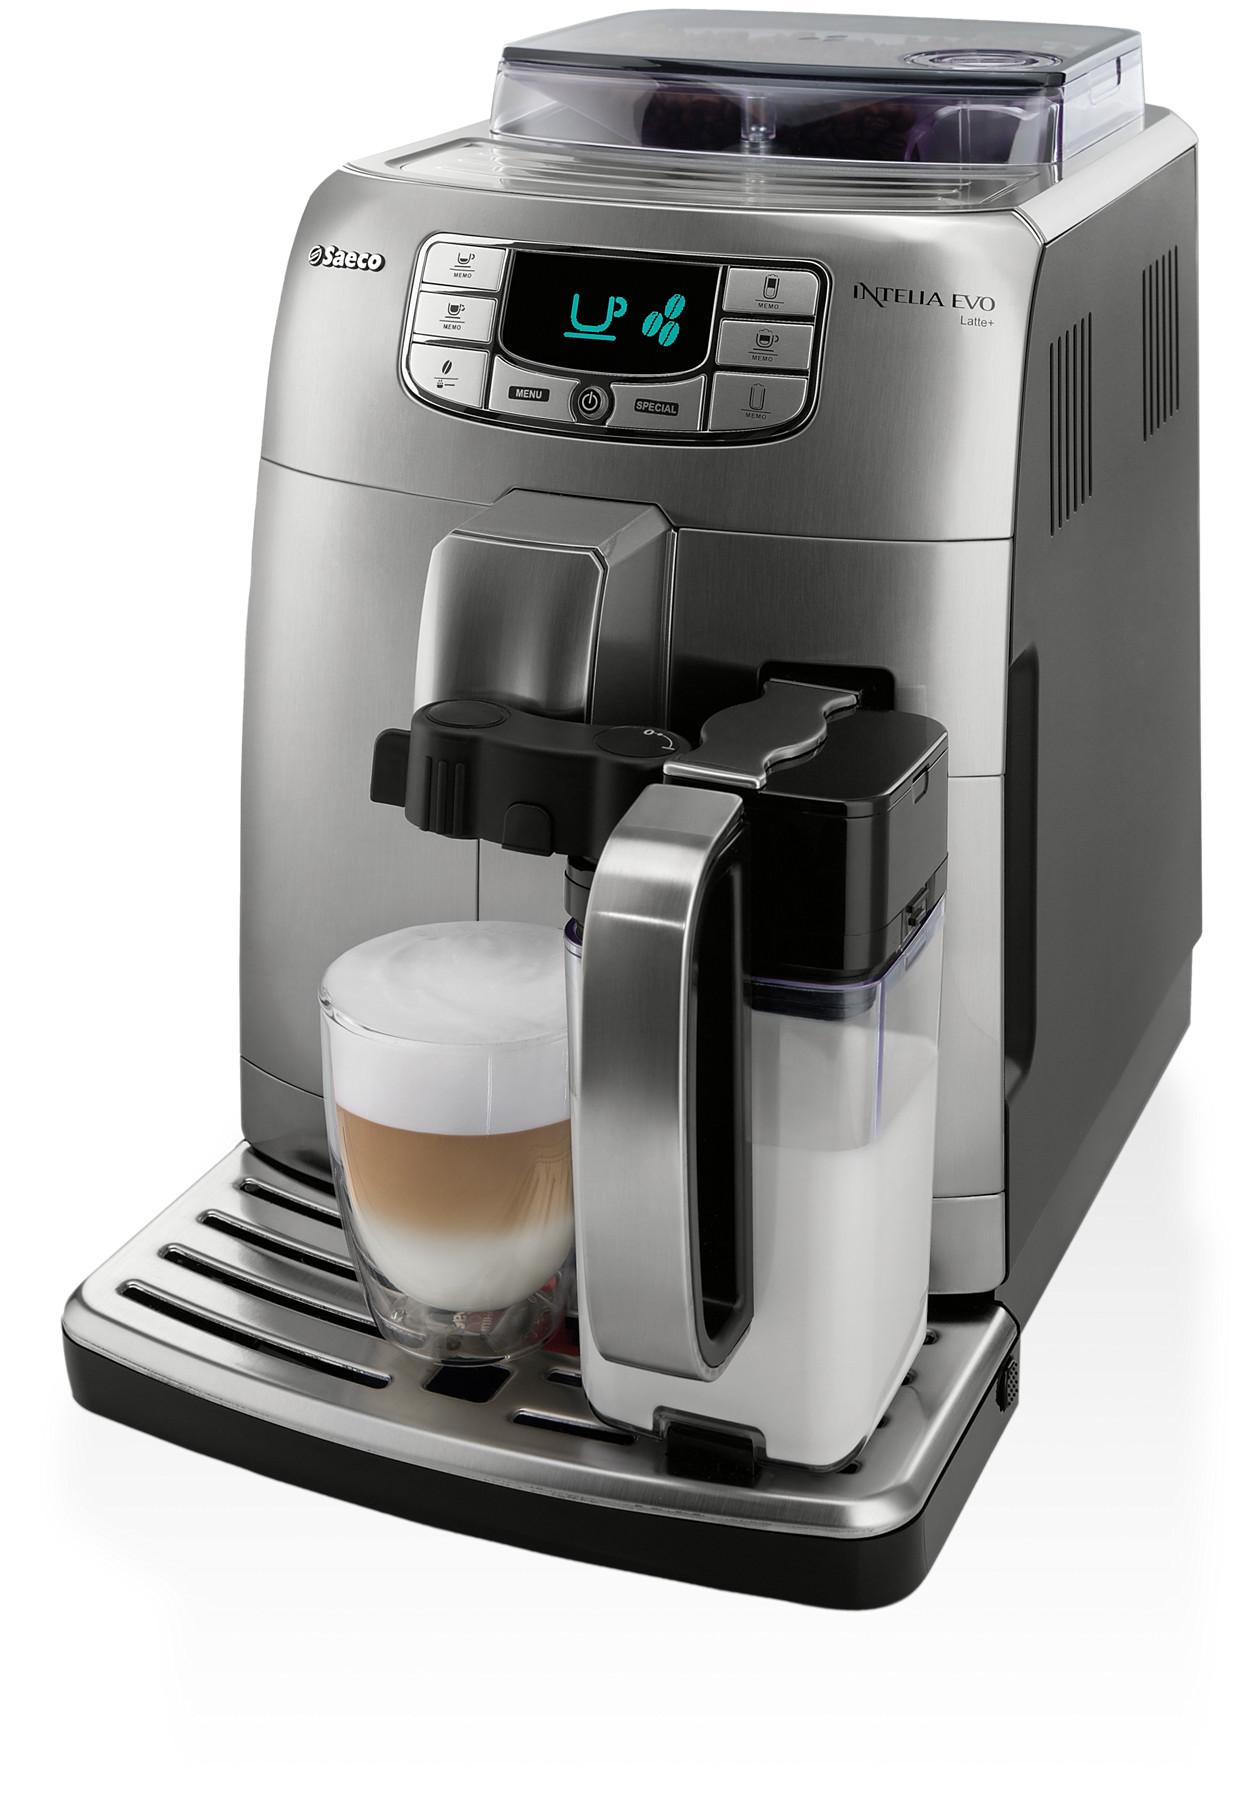 intelia evo kaffeevollautomat hd8754 11 saeco. Black Bedroom Furniture Sets. Home Design Ideas